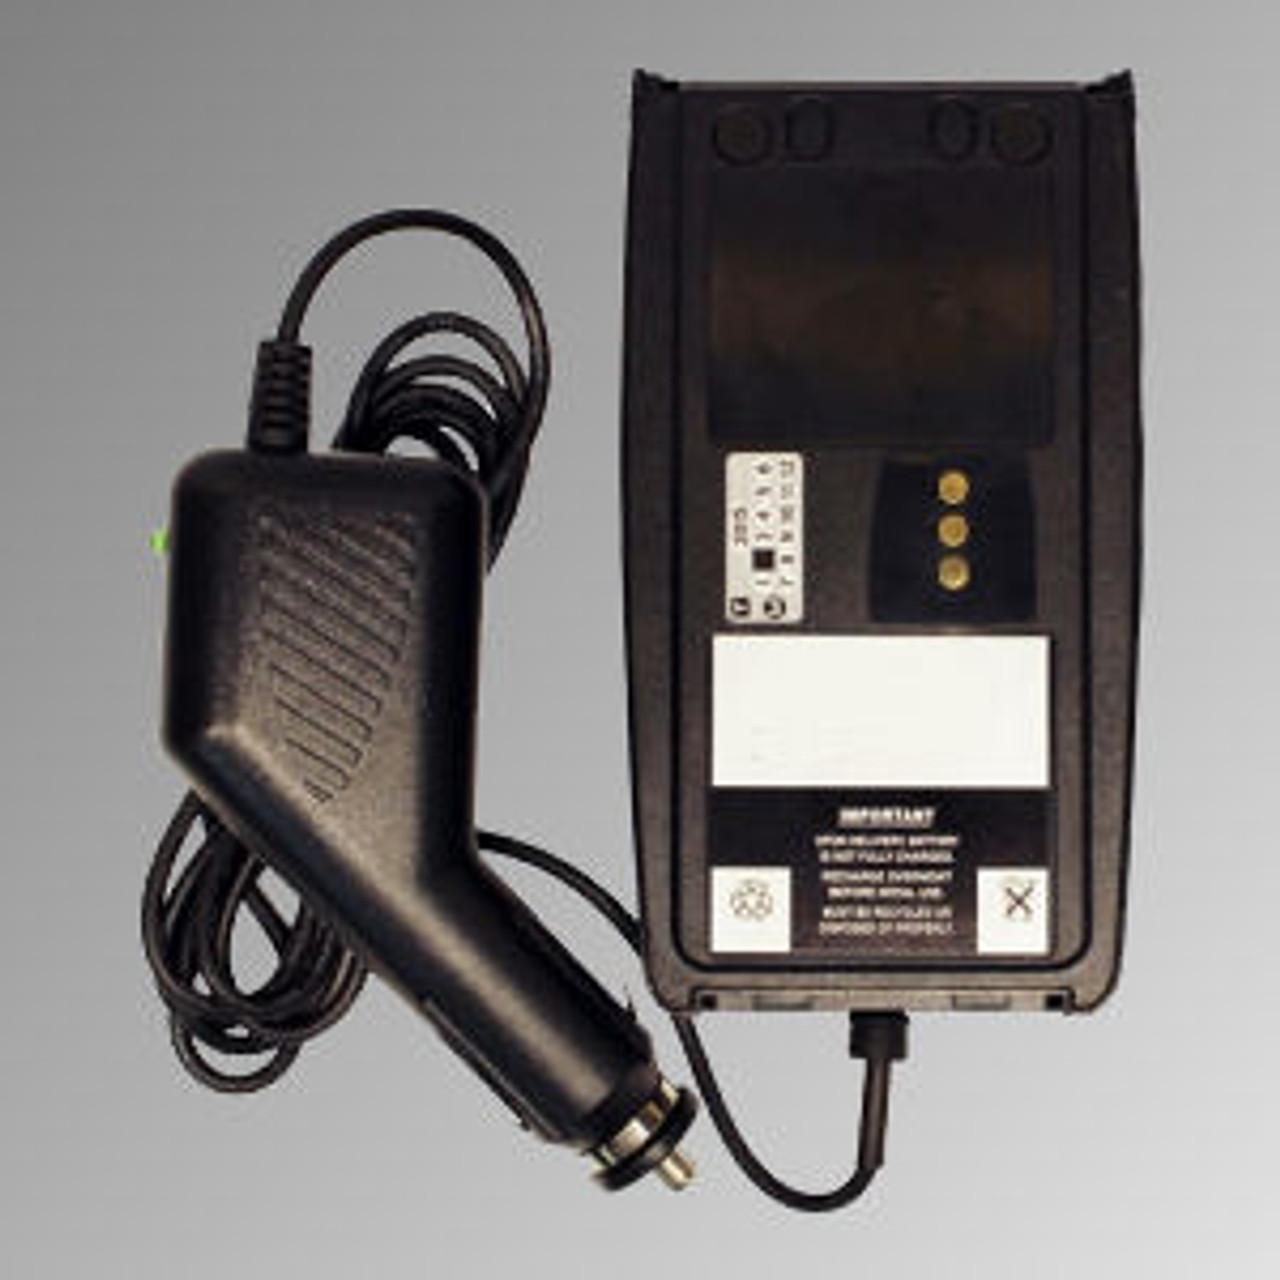 Harris XG-75 Battery Eliminator - 12VDC Cig Plug